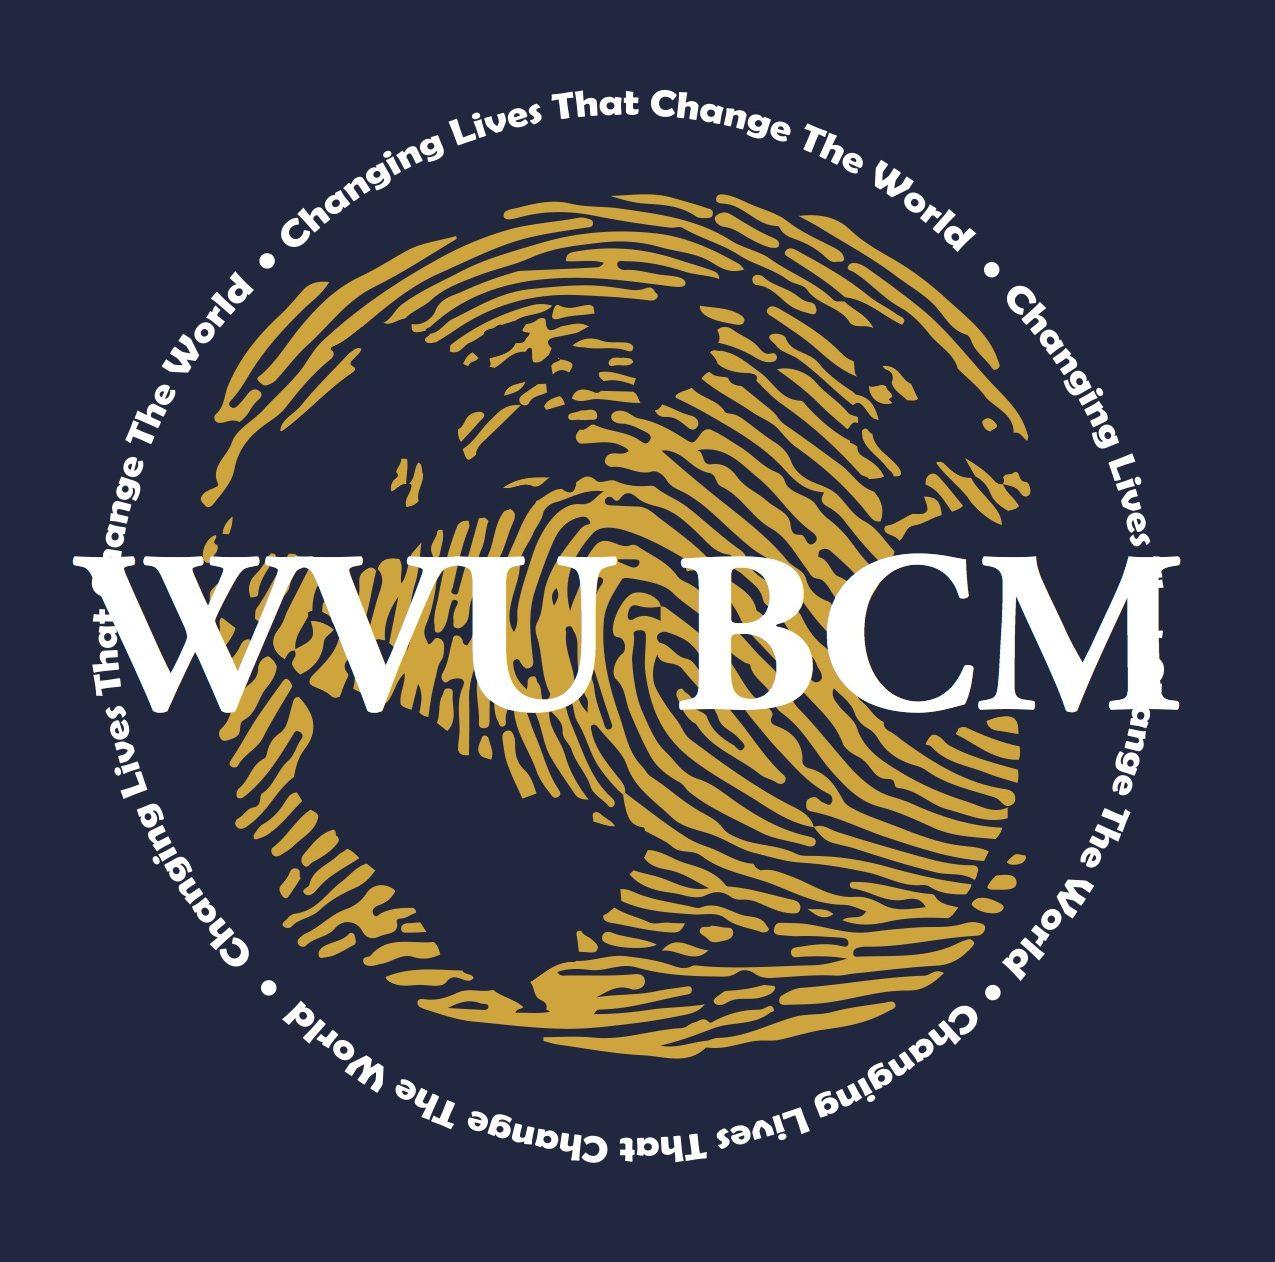 Baptist Campus Ministries at WVU